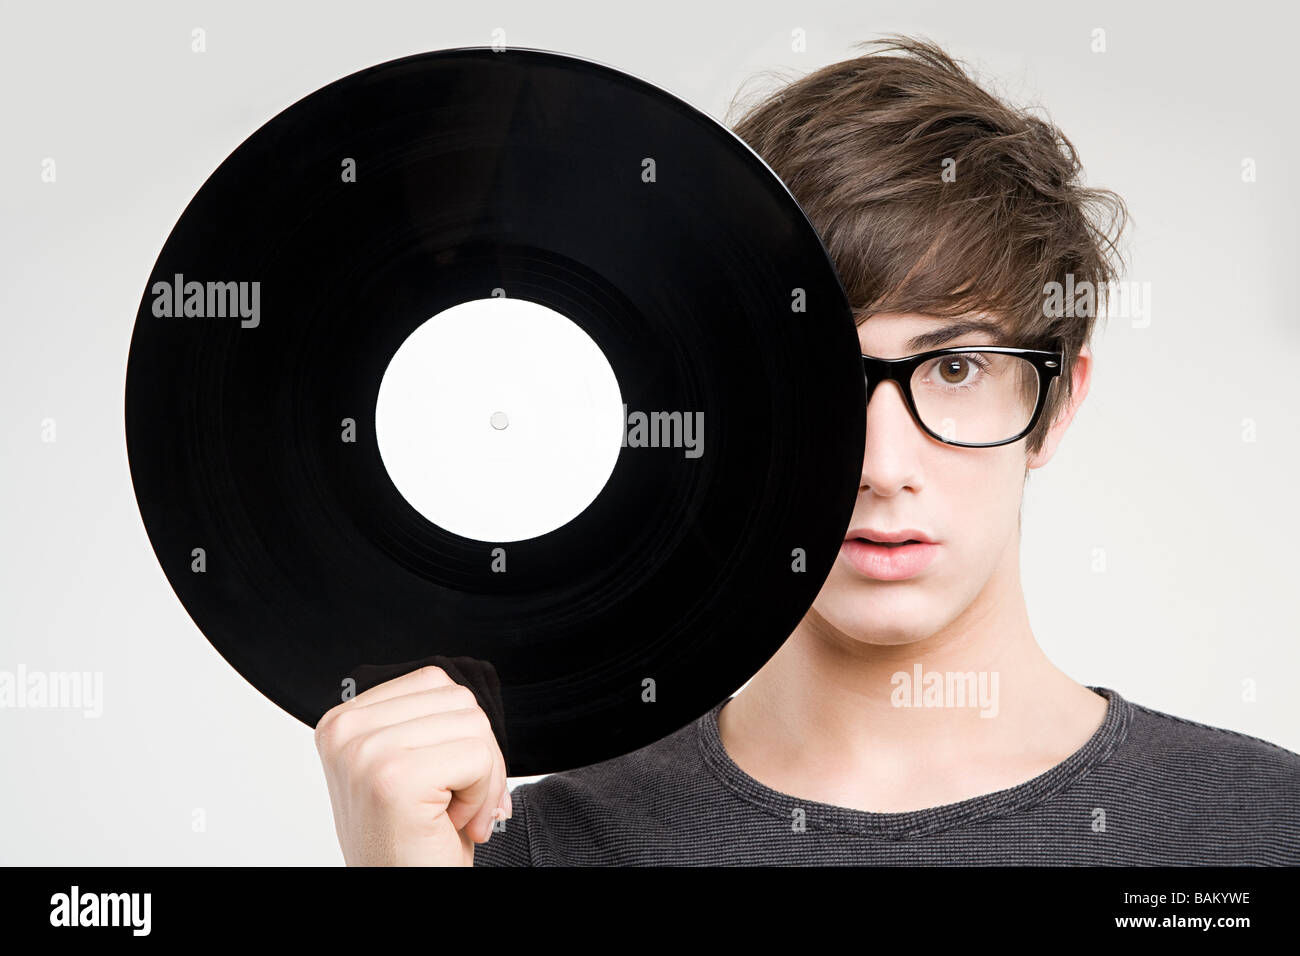 A teenage boy holding a vinyl record - Stock Image